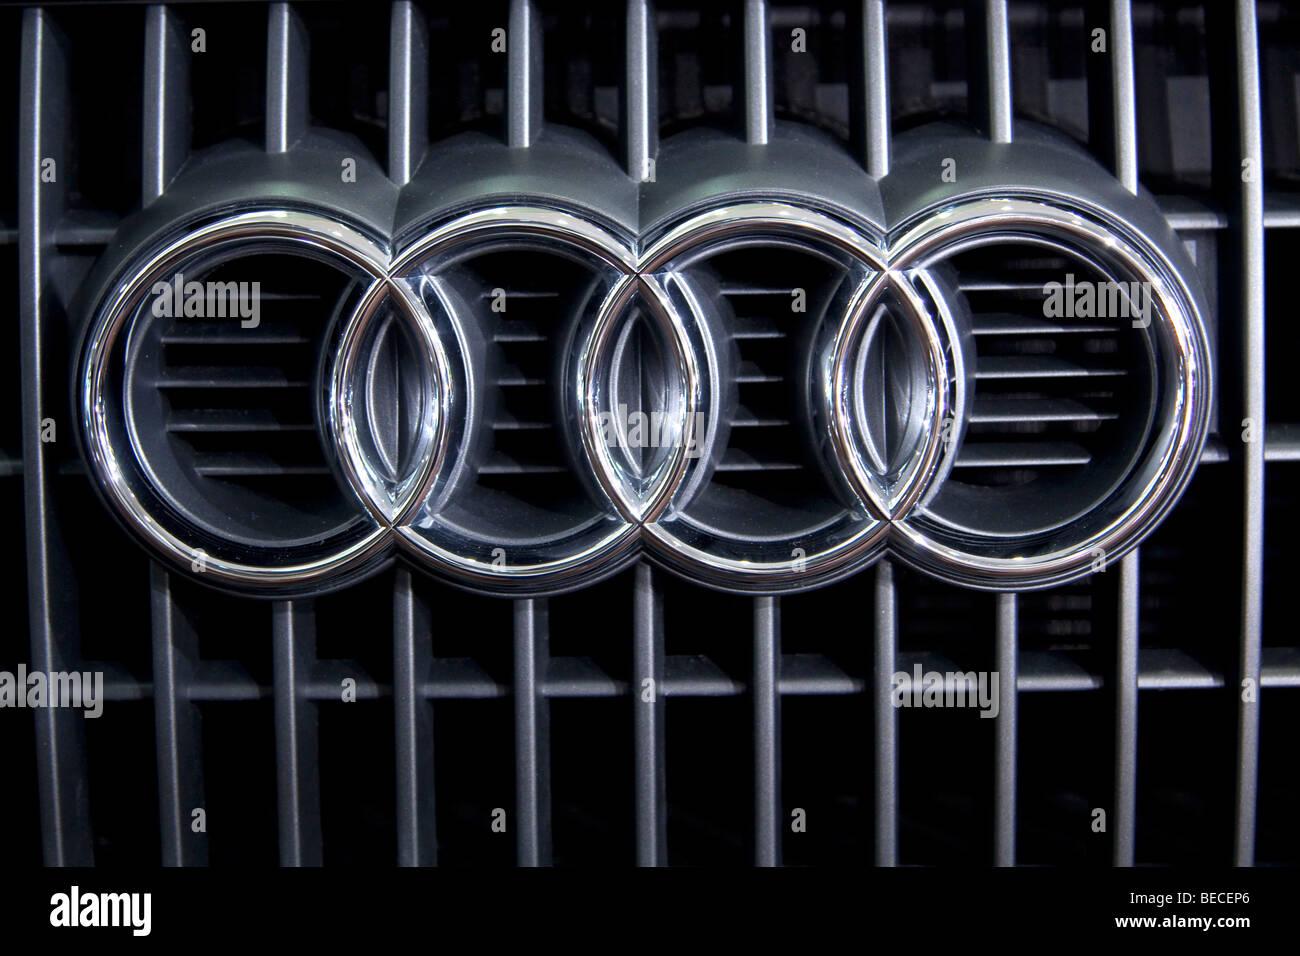 Audi emblem on a car - Stock Image